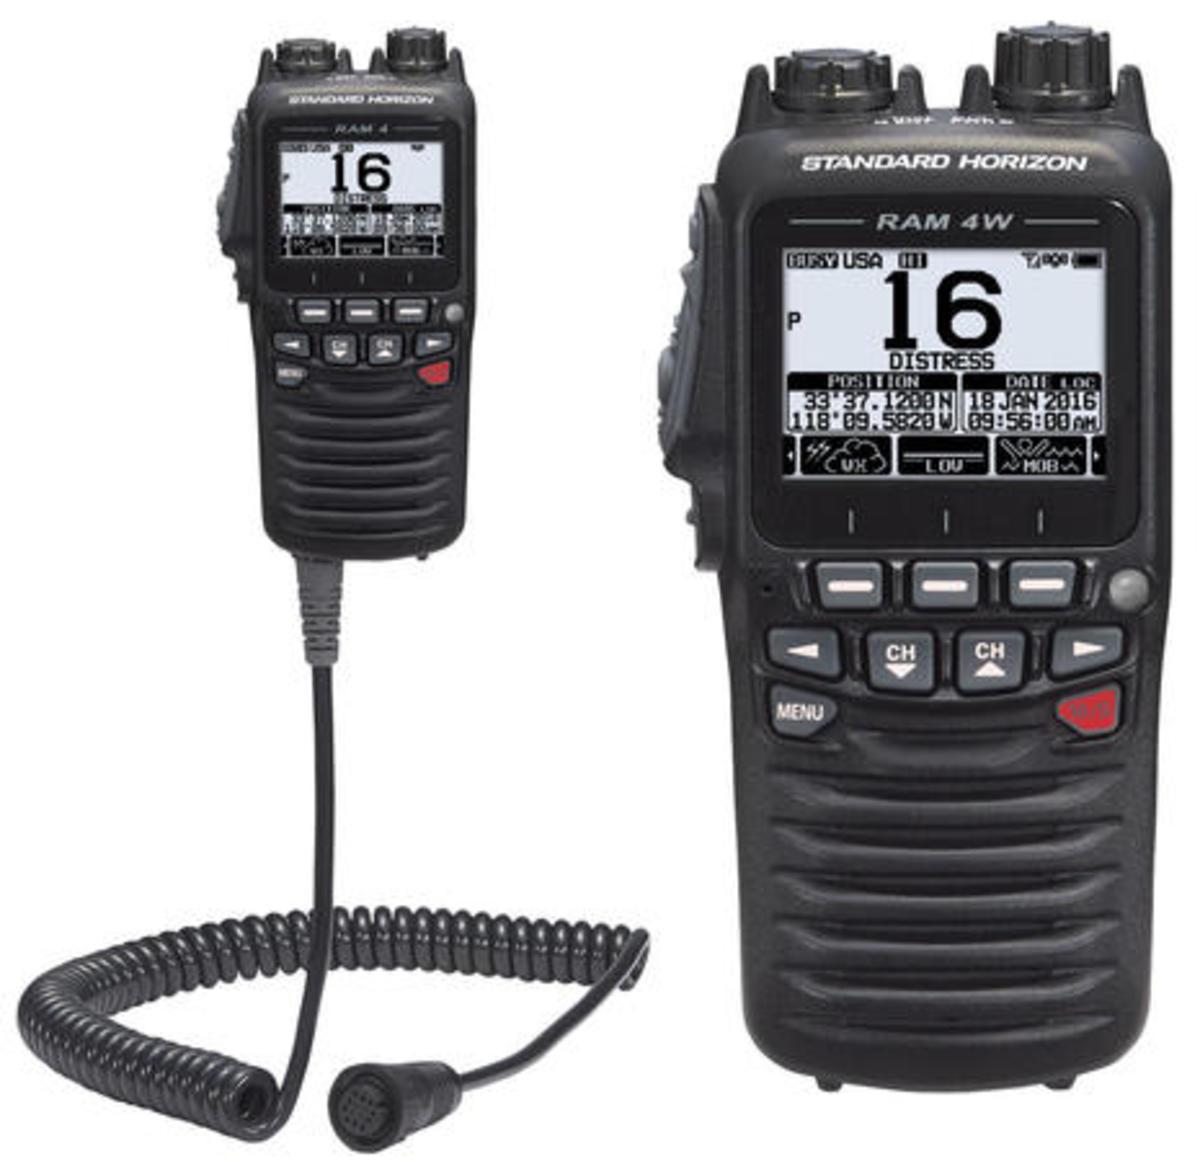 SH_RAM4_n_RAM4W_wireless_mics_for_GX6000-6500_radios_aPanbo.jpg